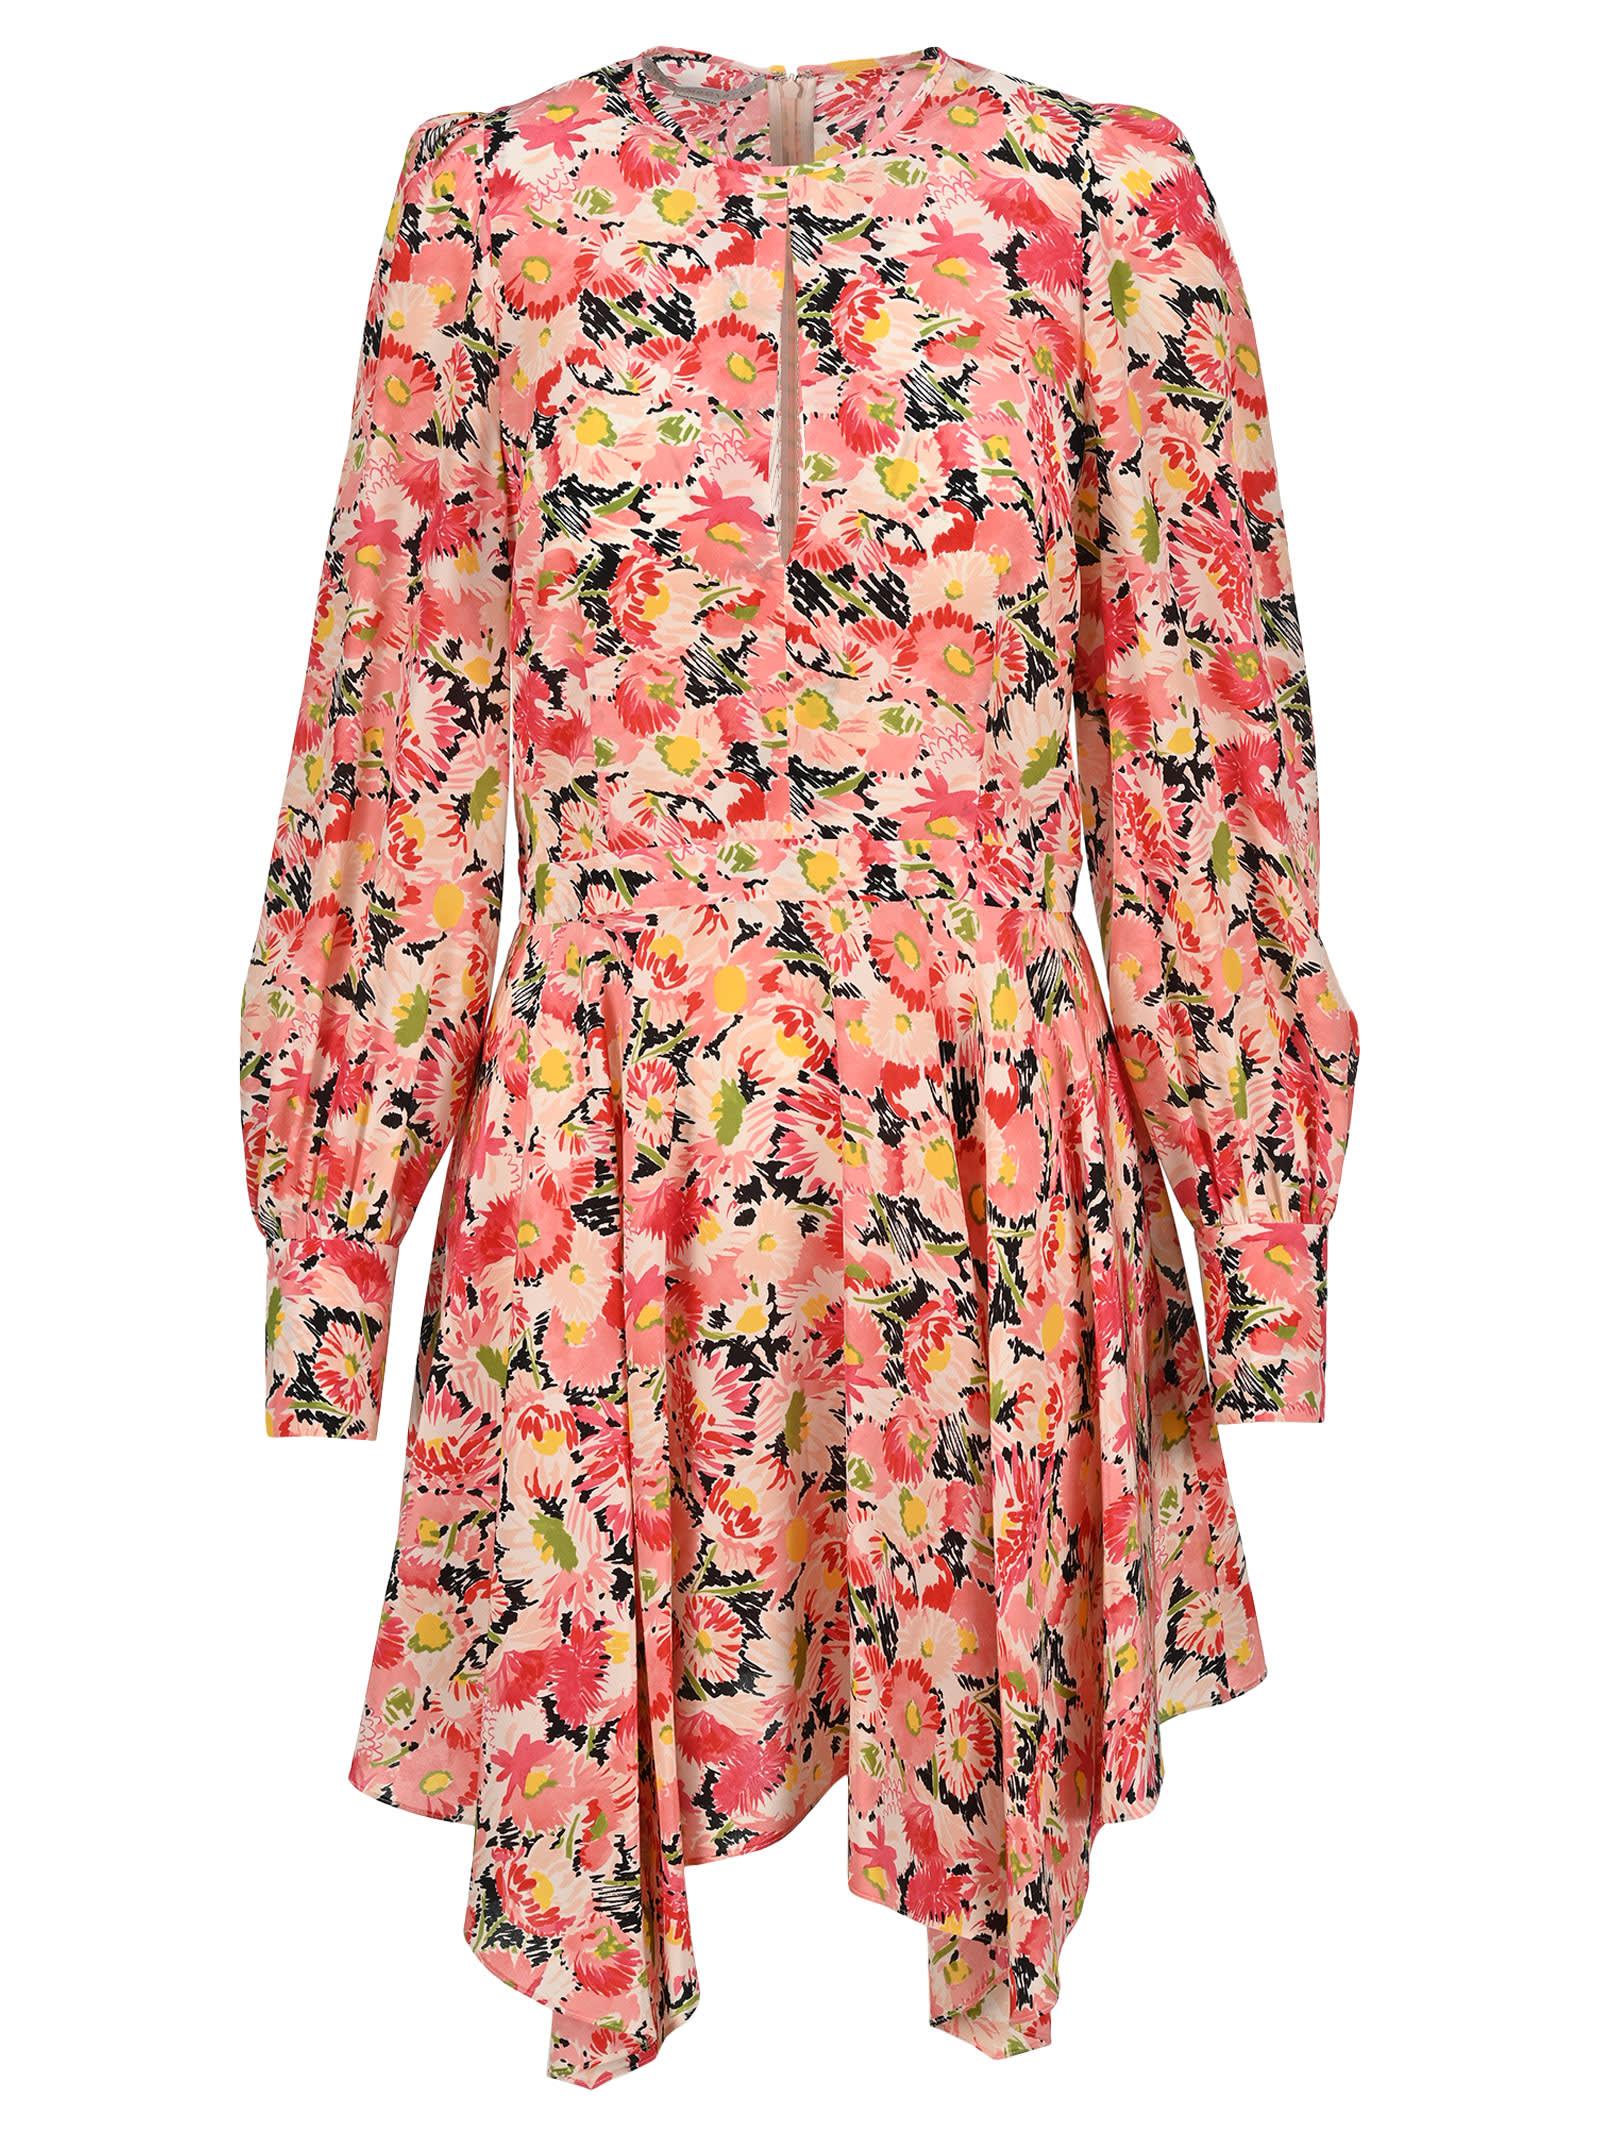 Stella Mccartney Felicity Floral Dress